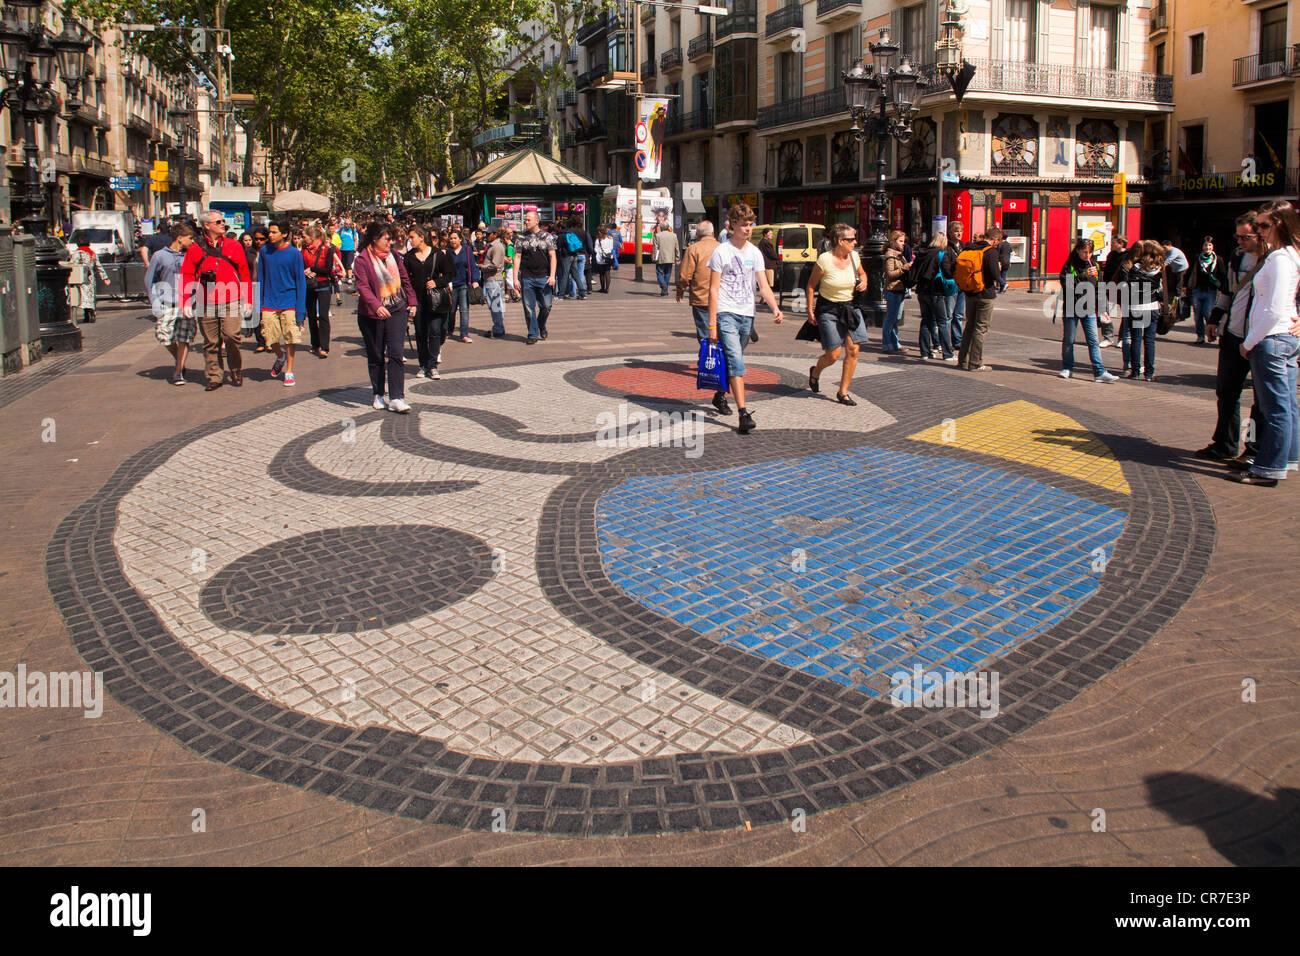 Mosaic by Miro, floor mosaic, tourists, Ramblas, Rambla, Rambles, pedestrian zone, Barcelona, Catalonia, Spain, - Stock Image